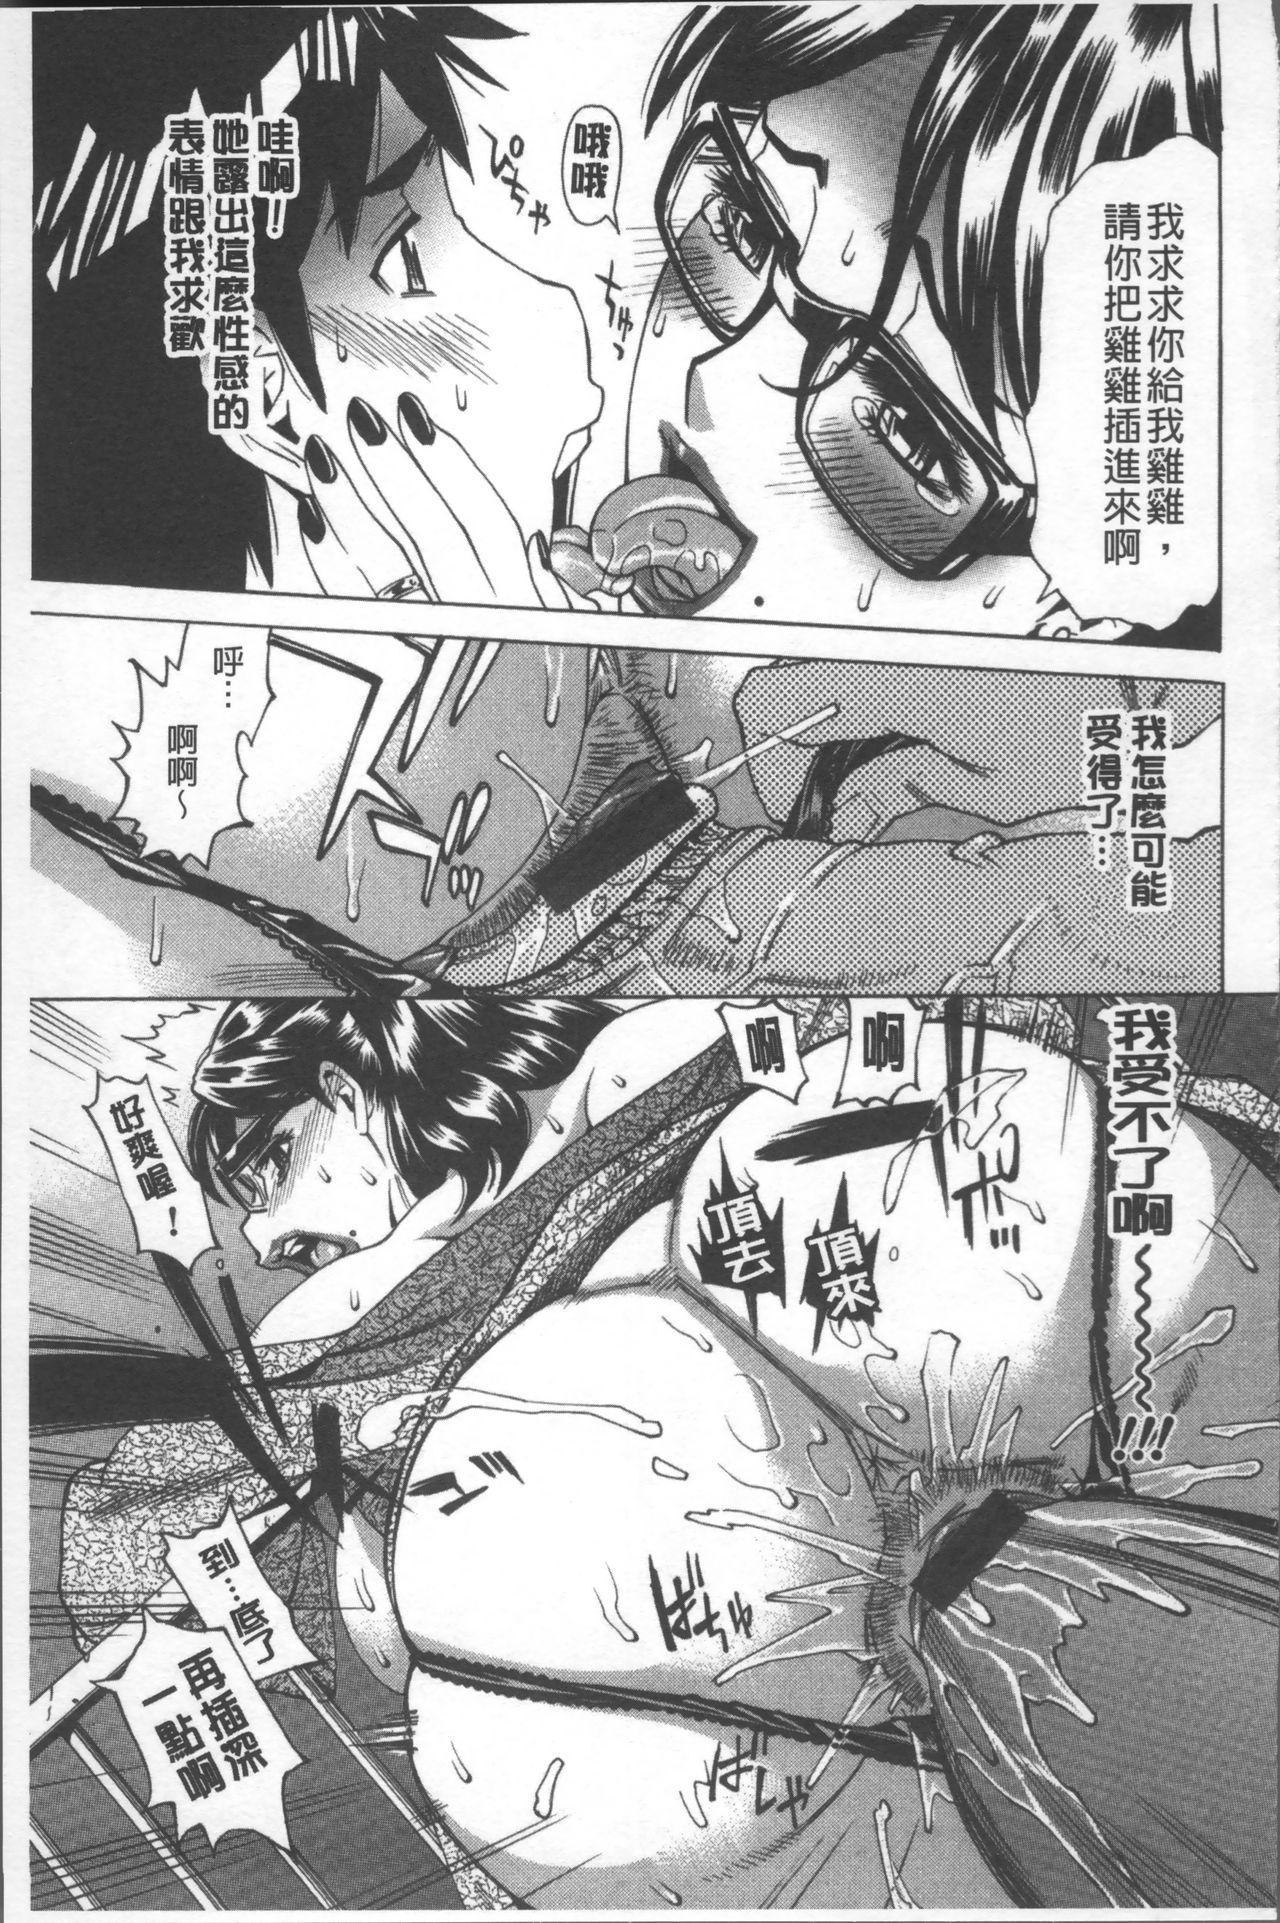 Hitozuma Kanshasai - SUPER EROTIC WIFE'S FESTIVAL 156